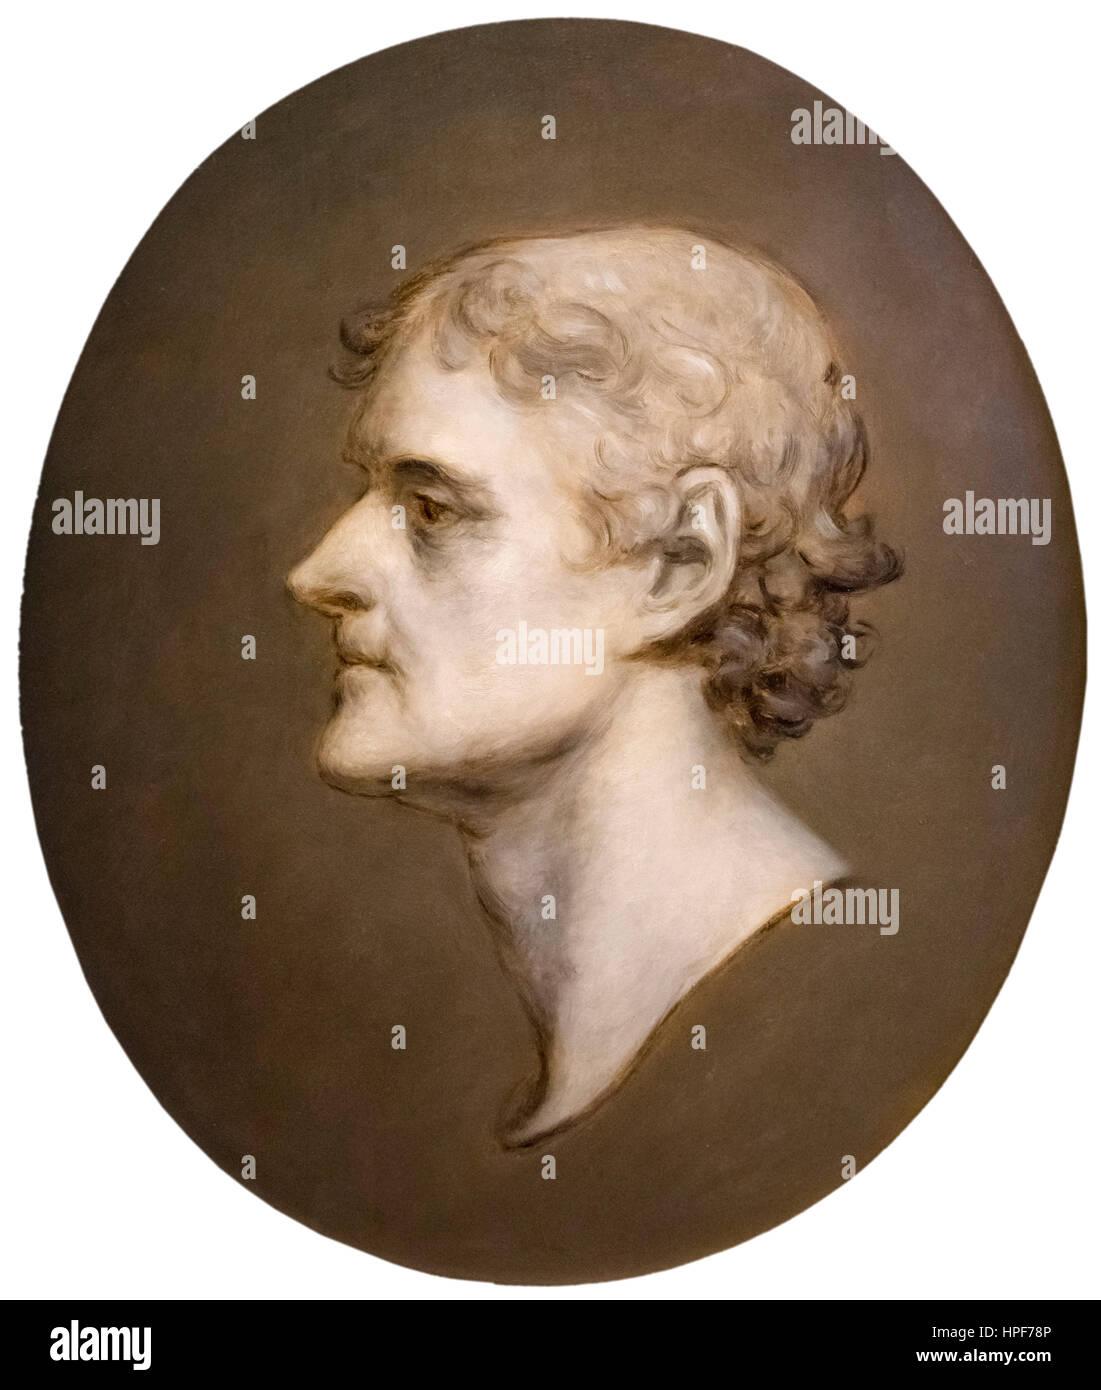 b0b165a57aaf Thomas Jefferson. Profile portrait of the 3rd US President